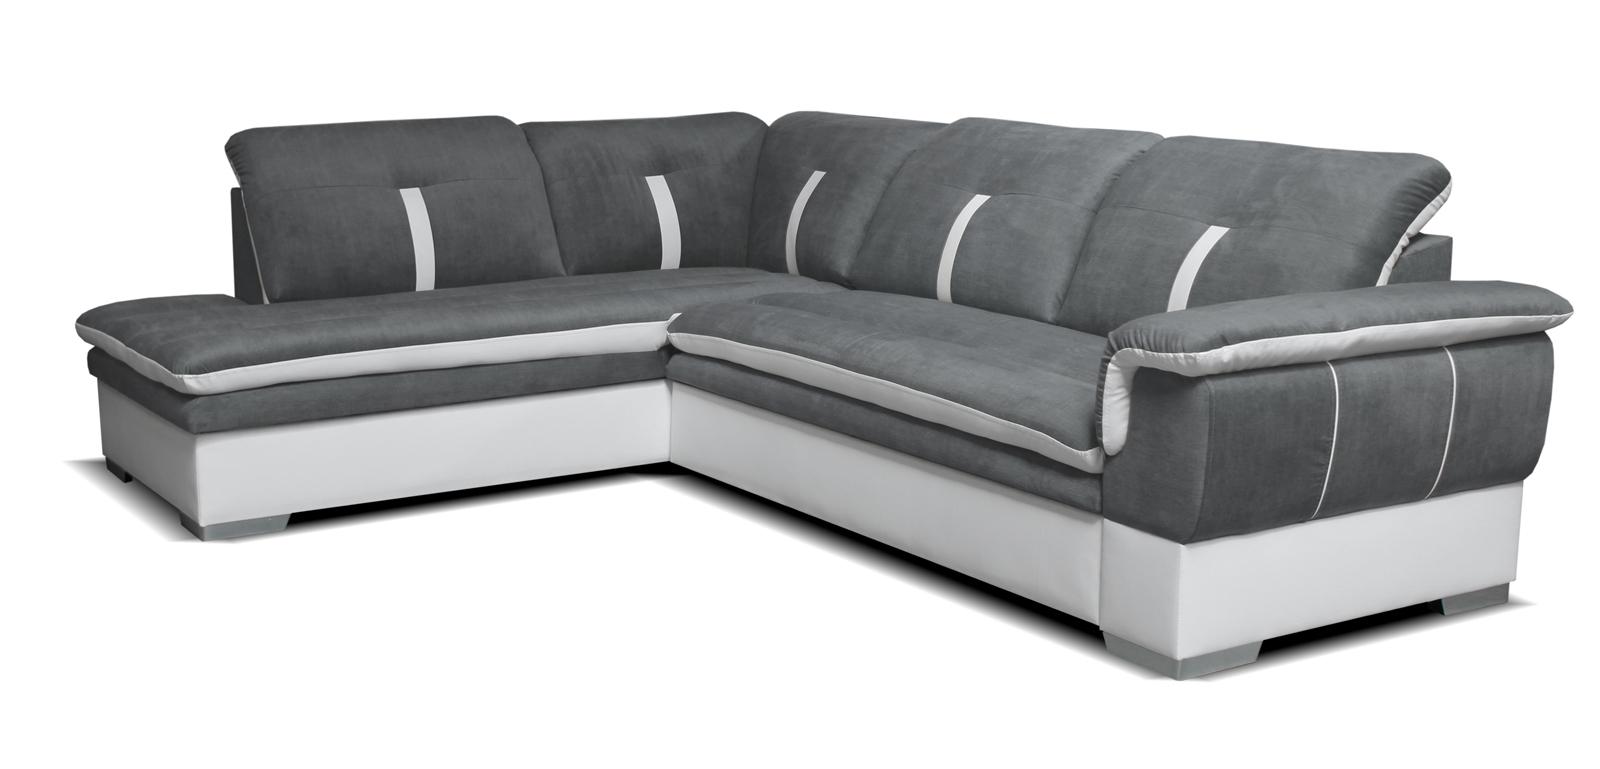 Rohová sedací souprava - Po-Sed - Galaxy L+2F (šedá + bílá) (L)